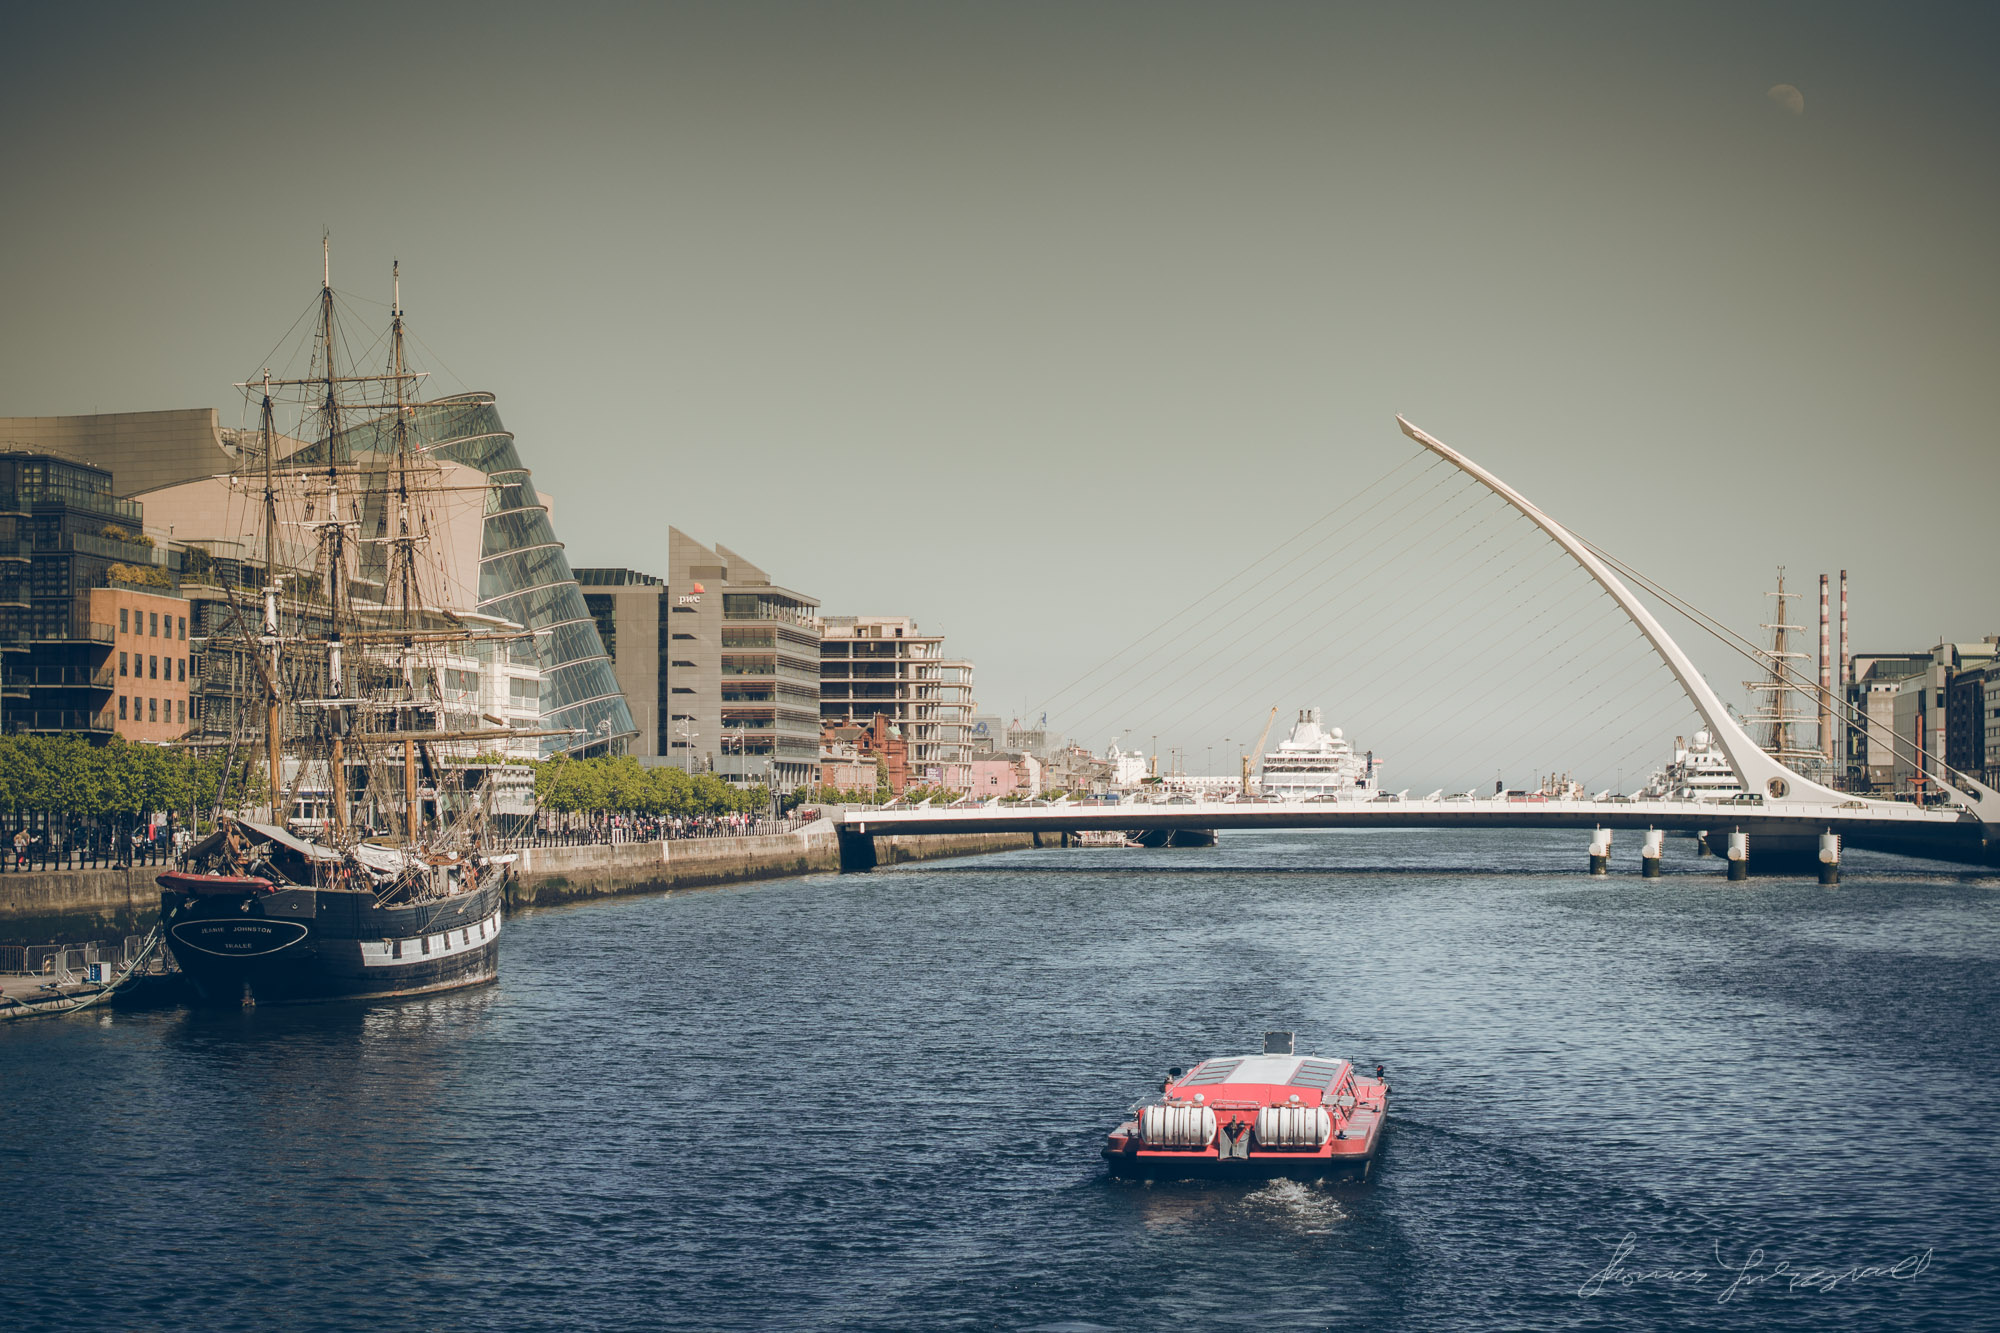 Modern Dublin and the River Liffey